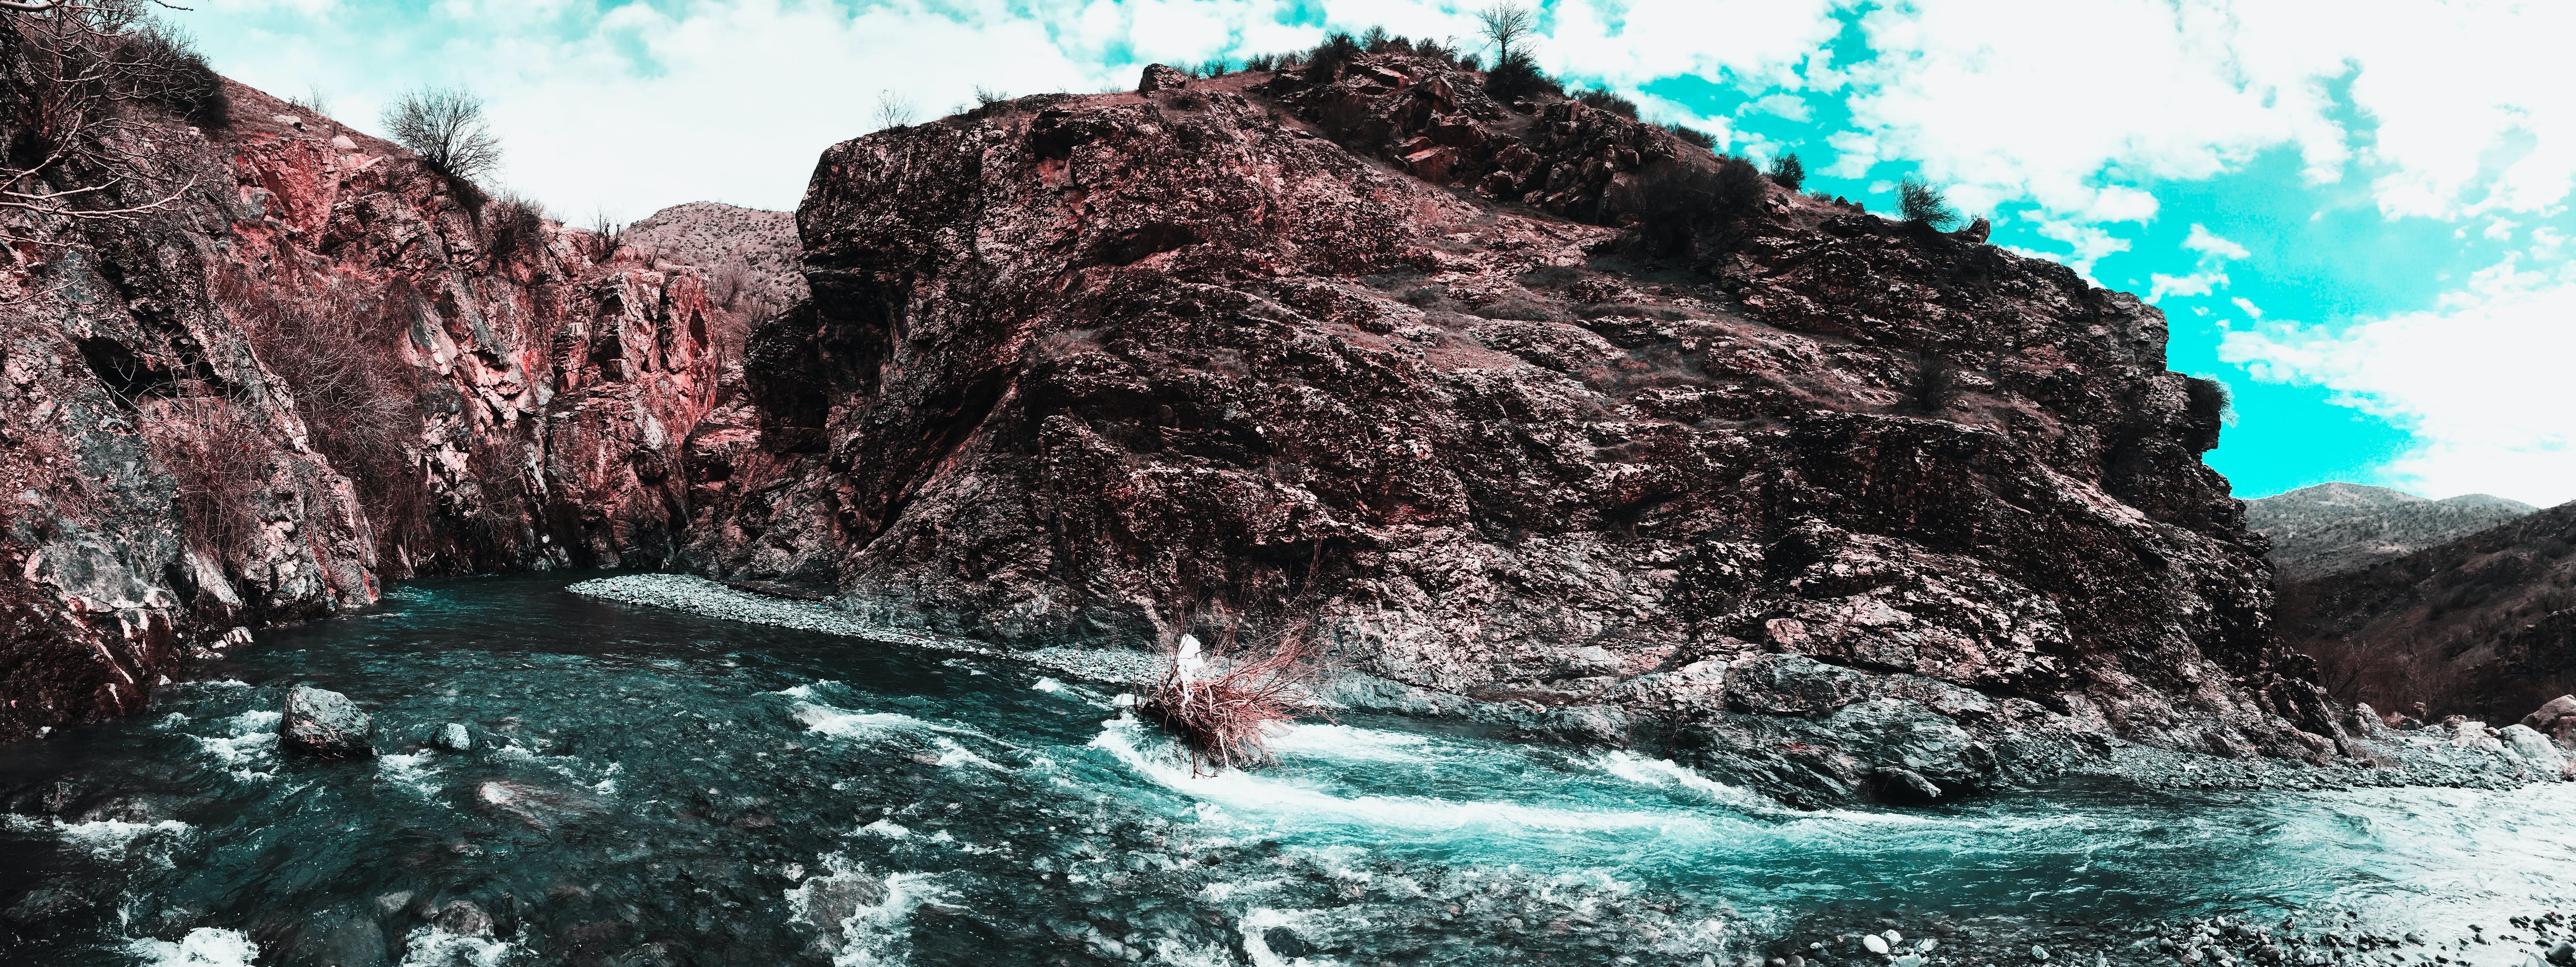 Free stock photo of 4k wallpaper, blue, blue mountains, blue sky